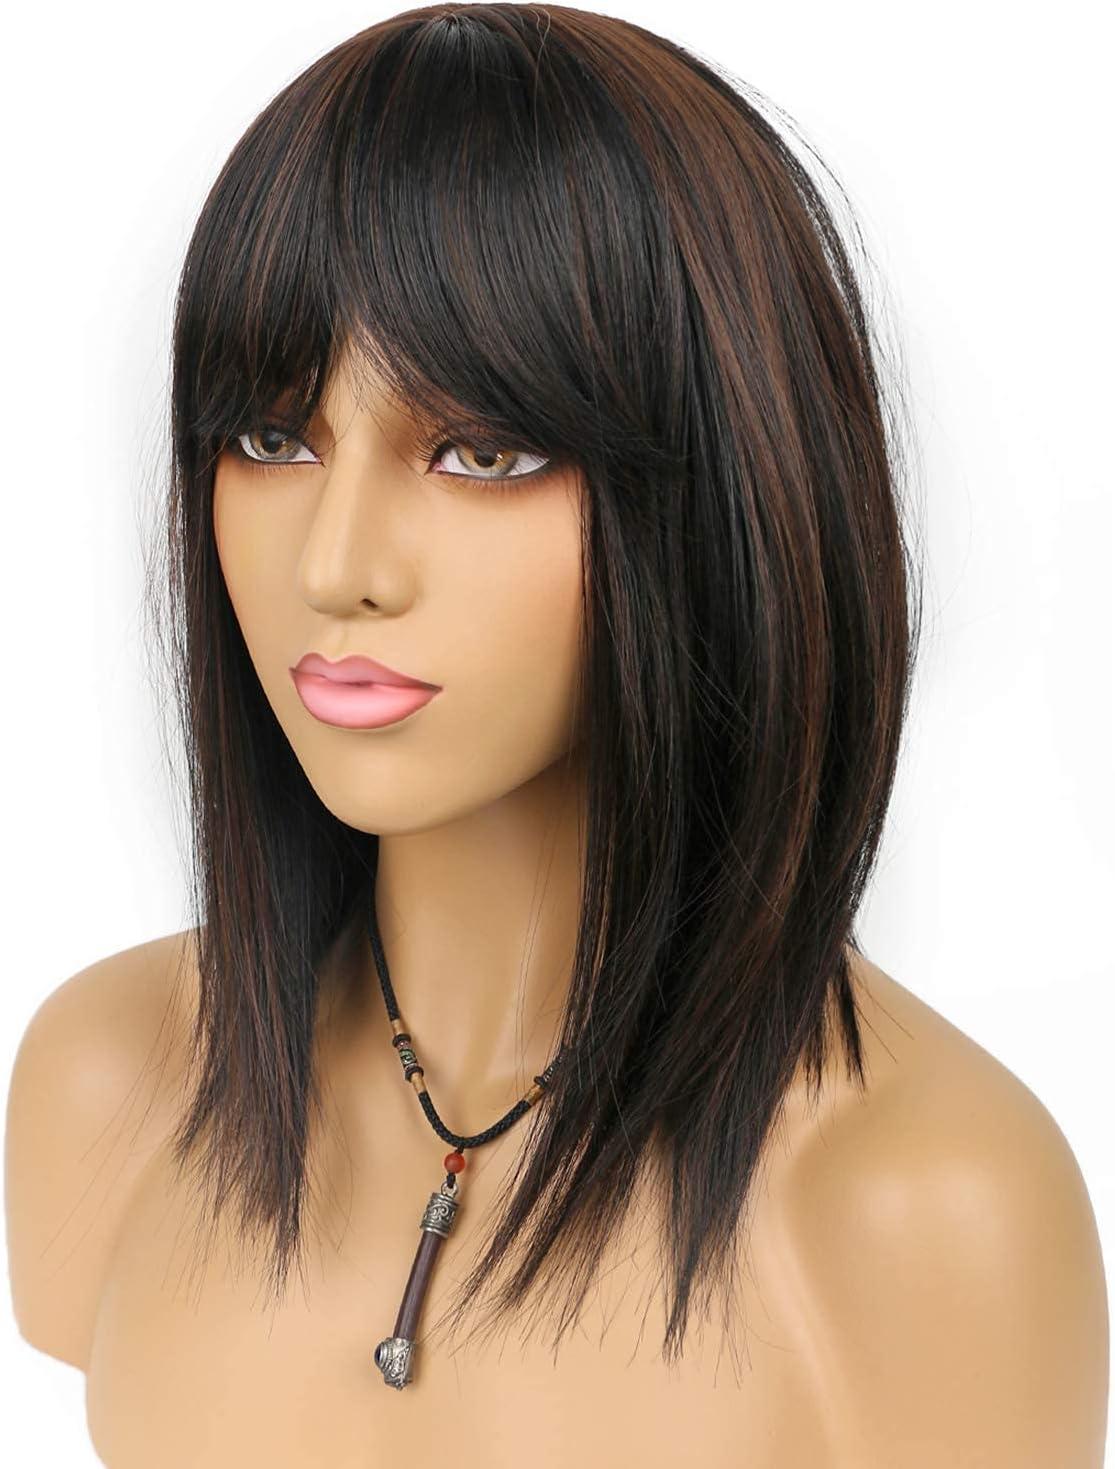 Pelucas de longitud media larga recta con flequillo natural negro mezcla ligera castaño sintético pelucas con flequillo limpio para mujeres fiesta uso diario